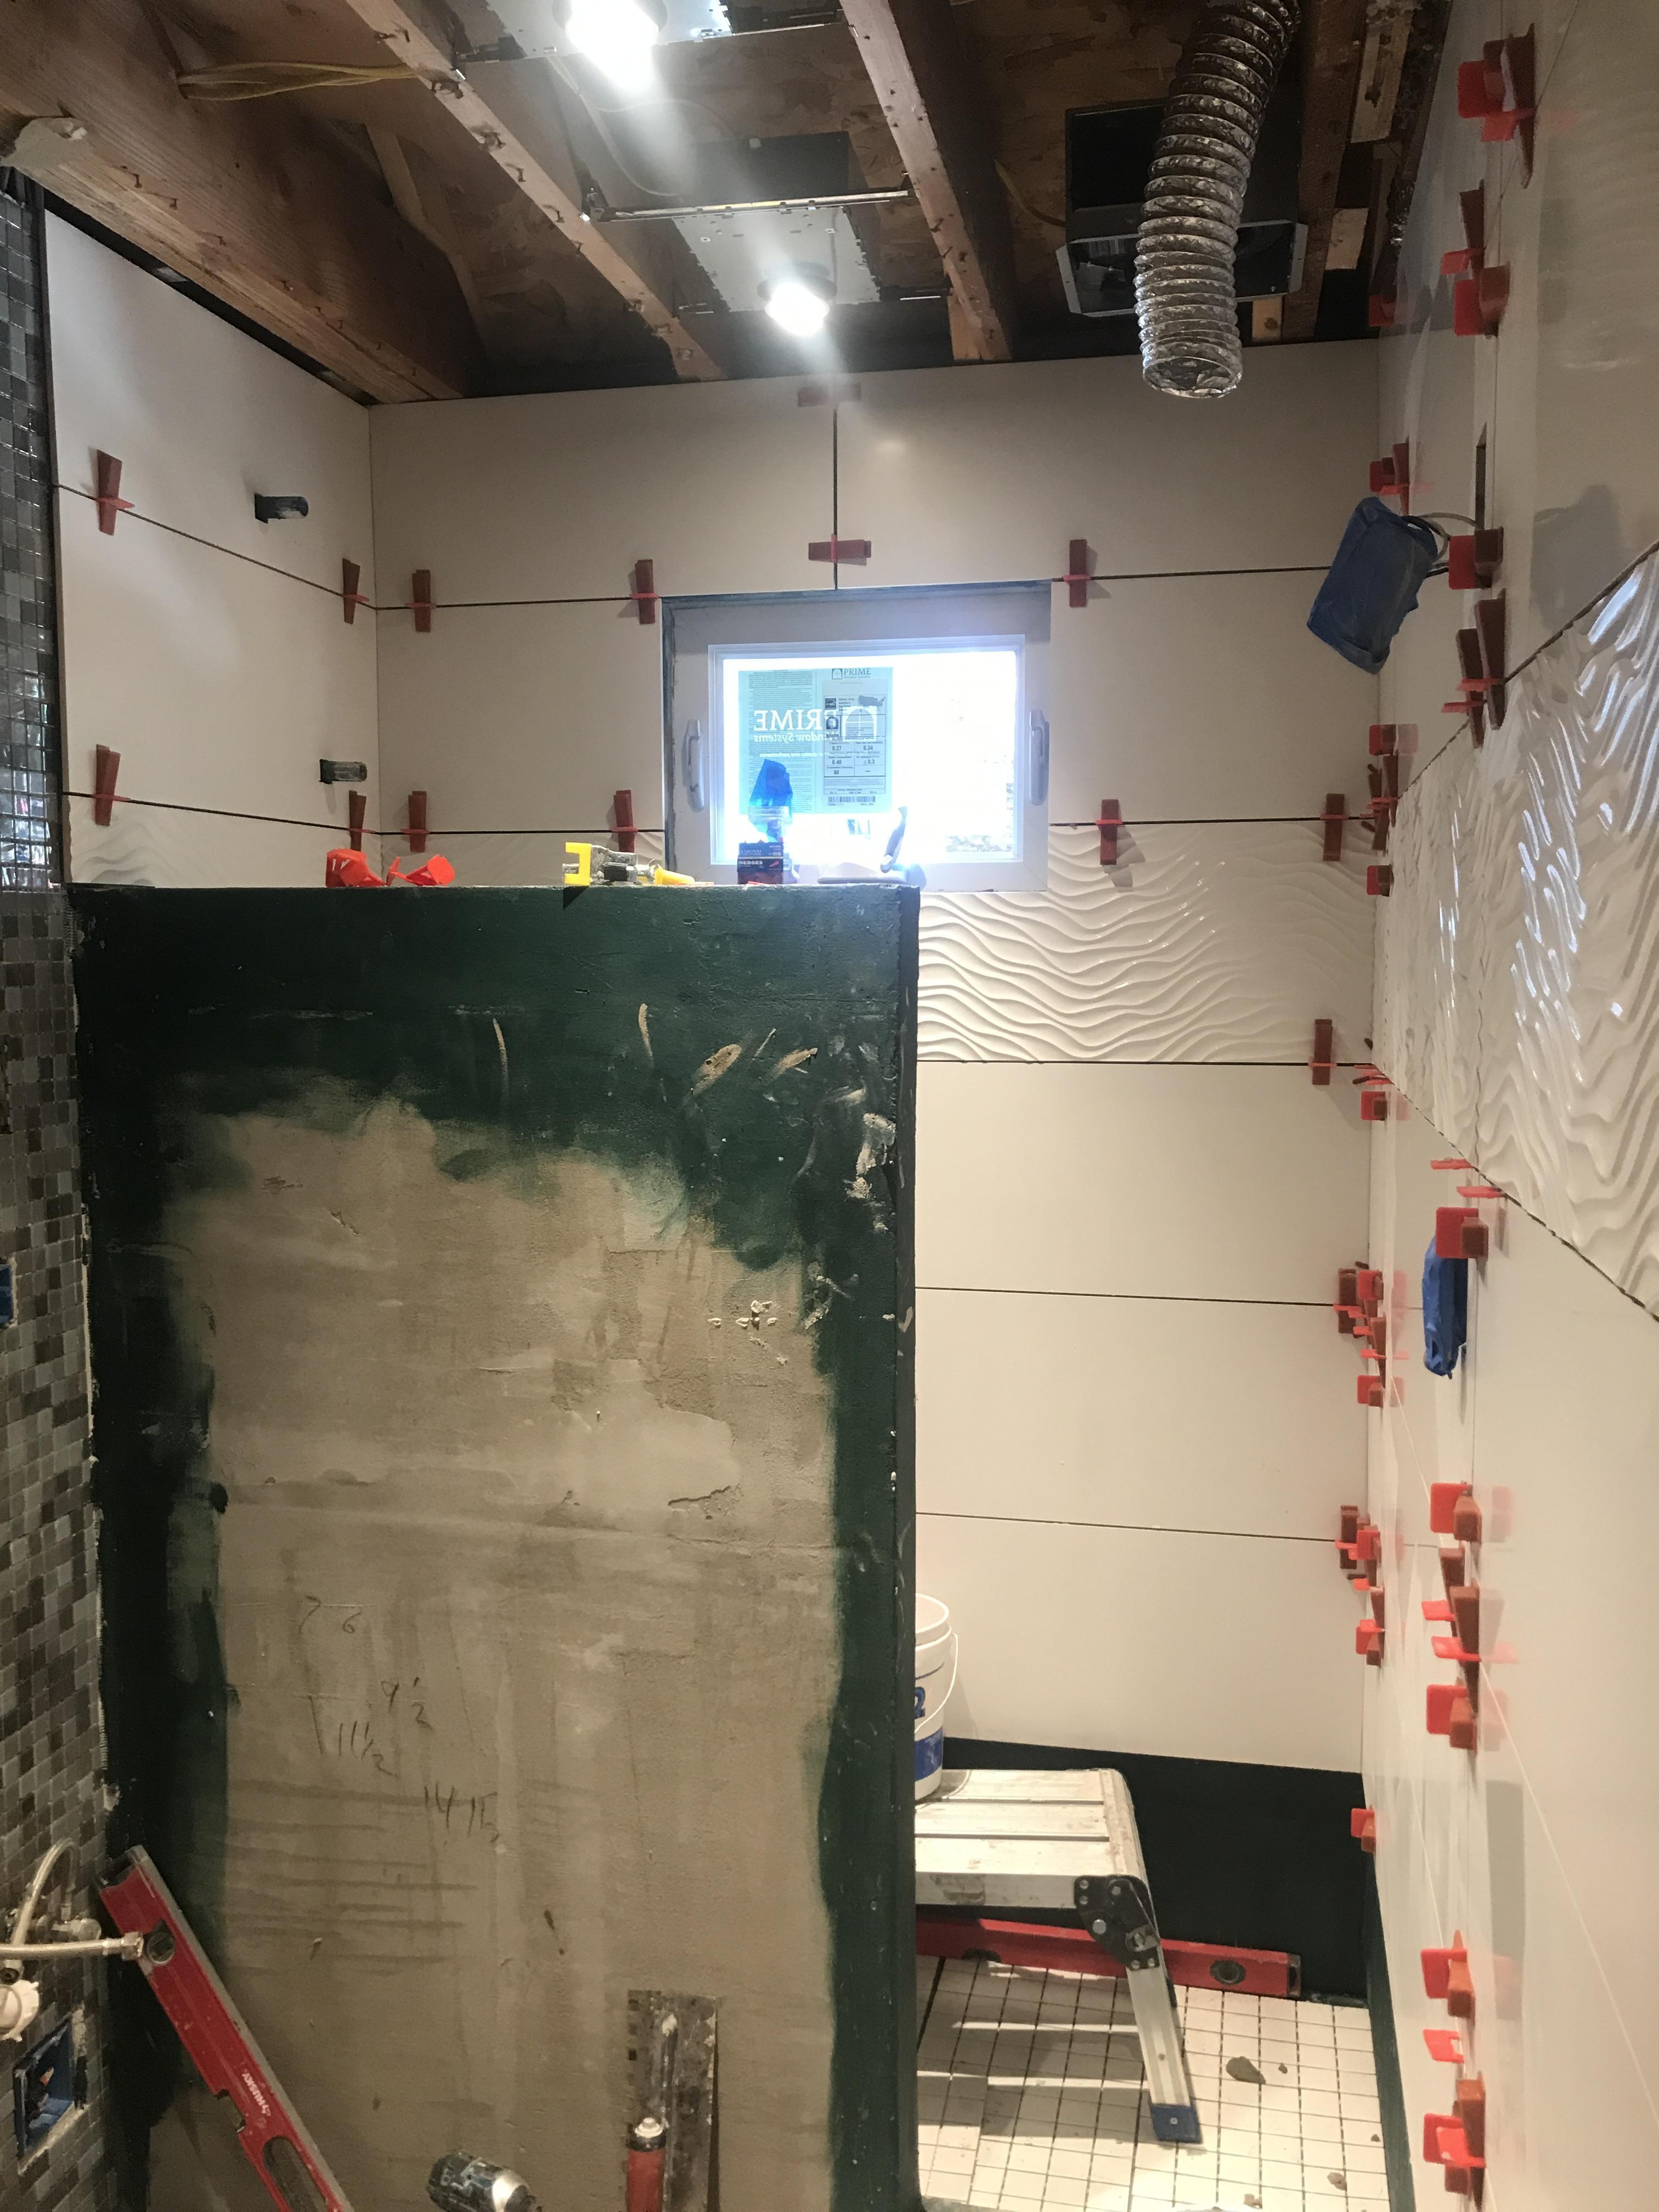 Help me out. Complete bathroom tiled.-5fe14fd3-8615-4aaa-abc1-7aa305af87f2_1528155199856.jpeg